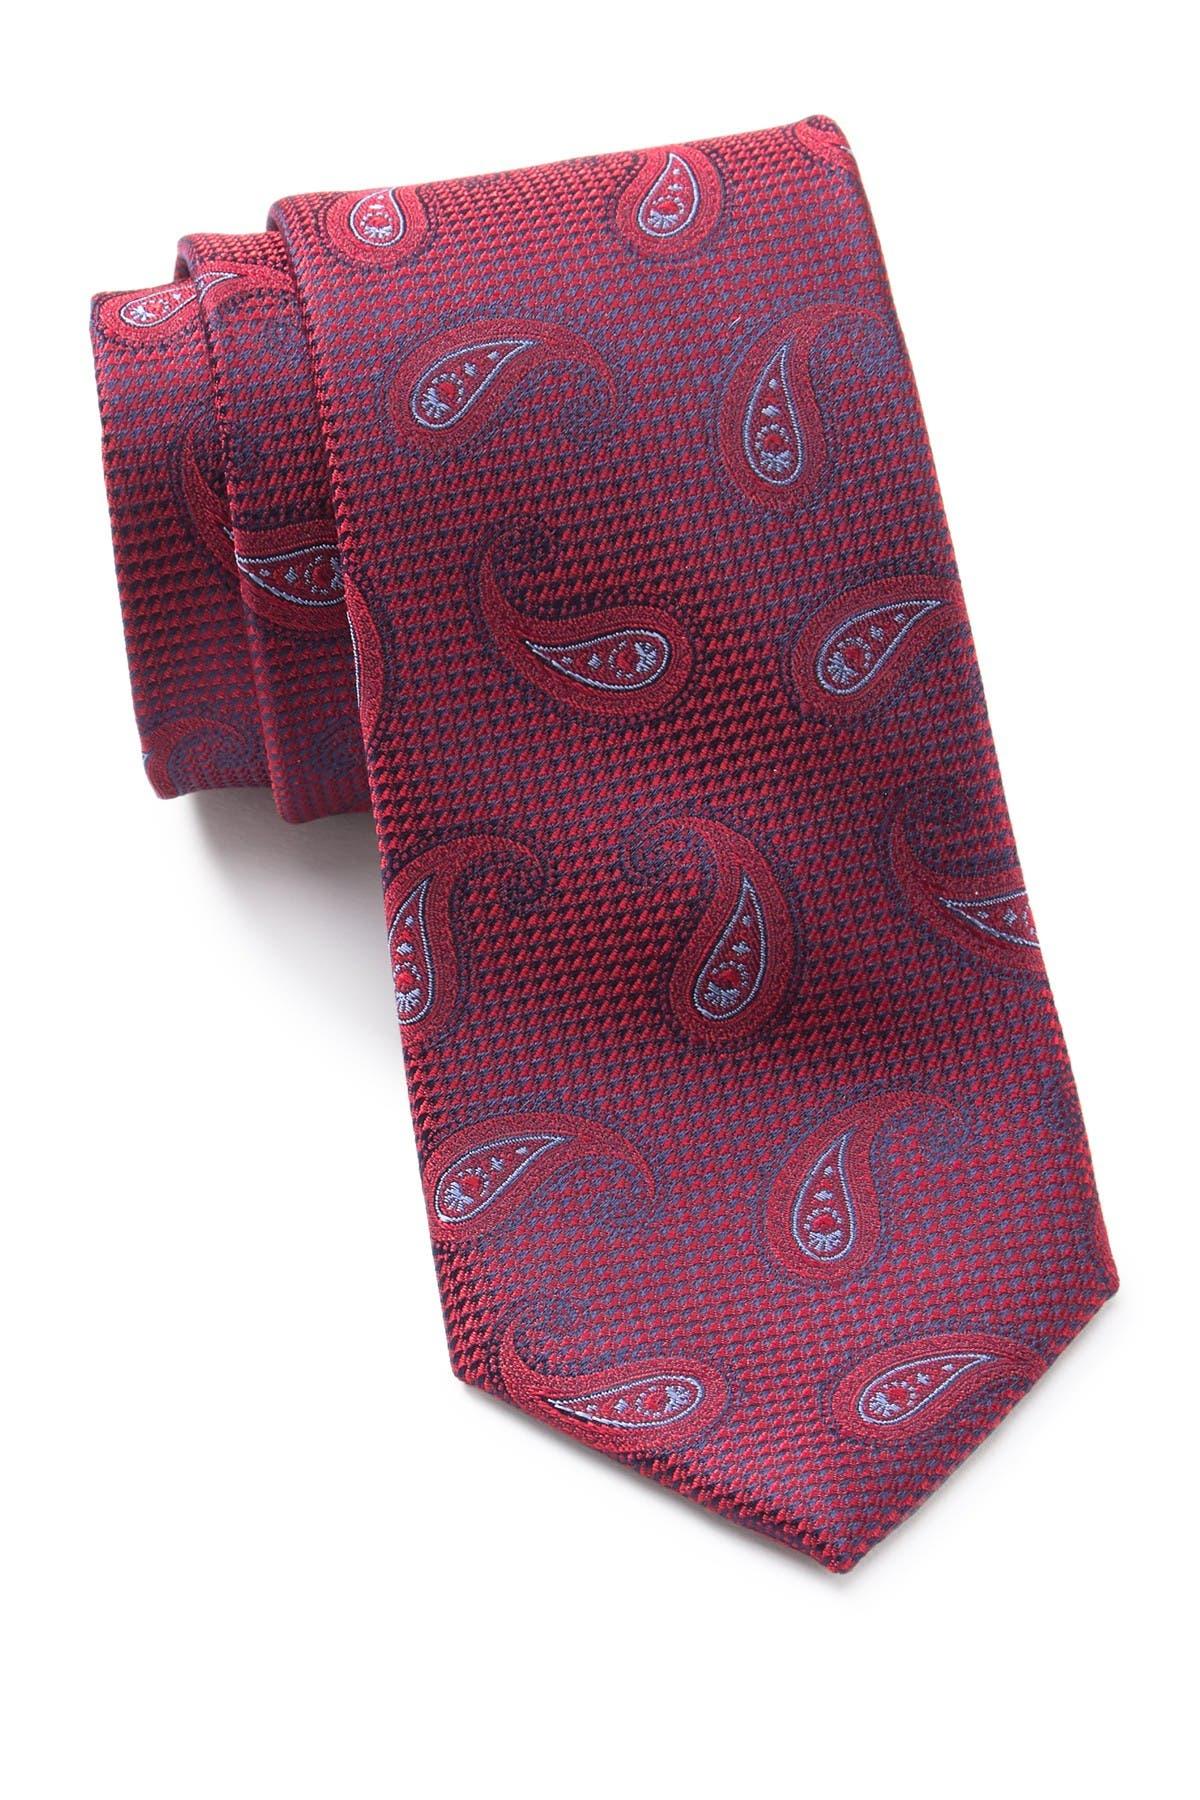 Image of Ted Baker London Tossed Pine Silk Tie